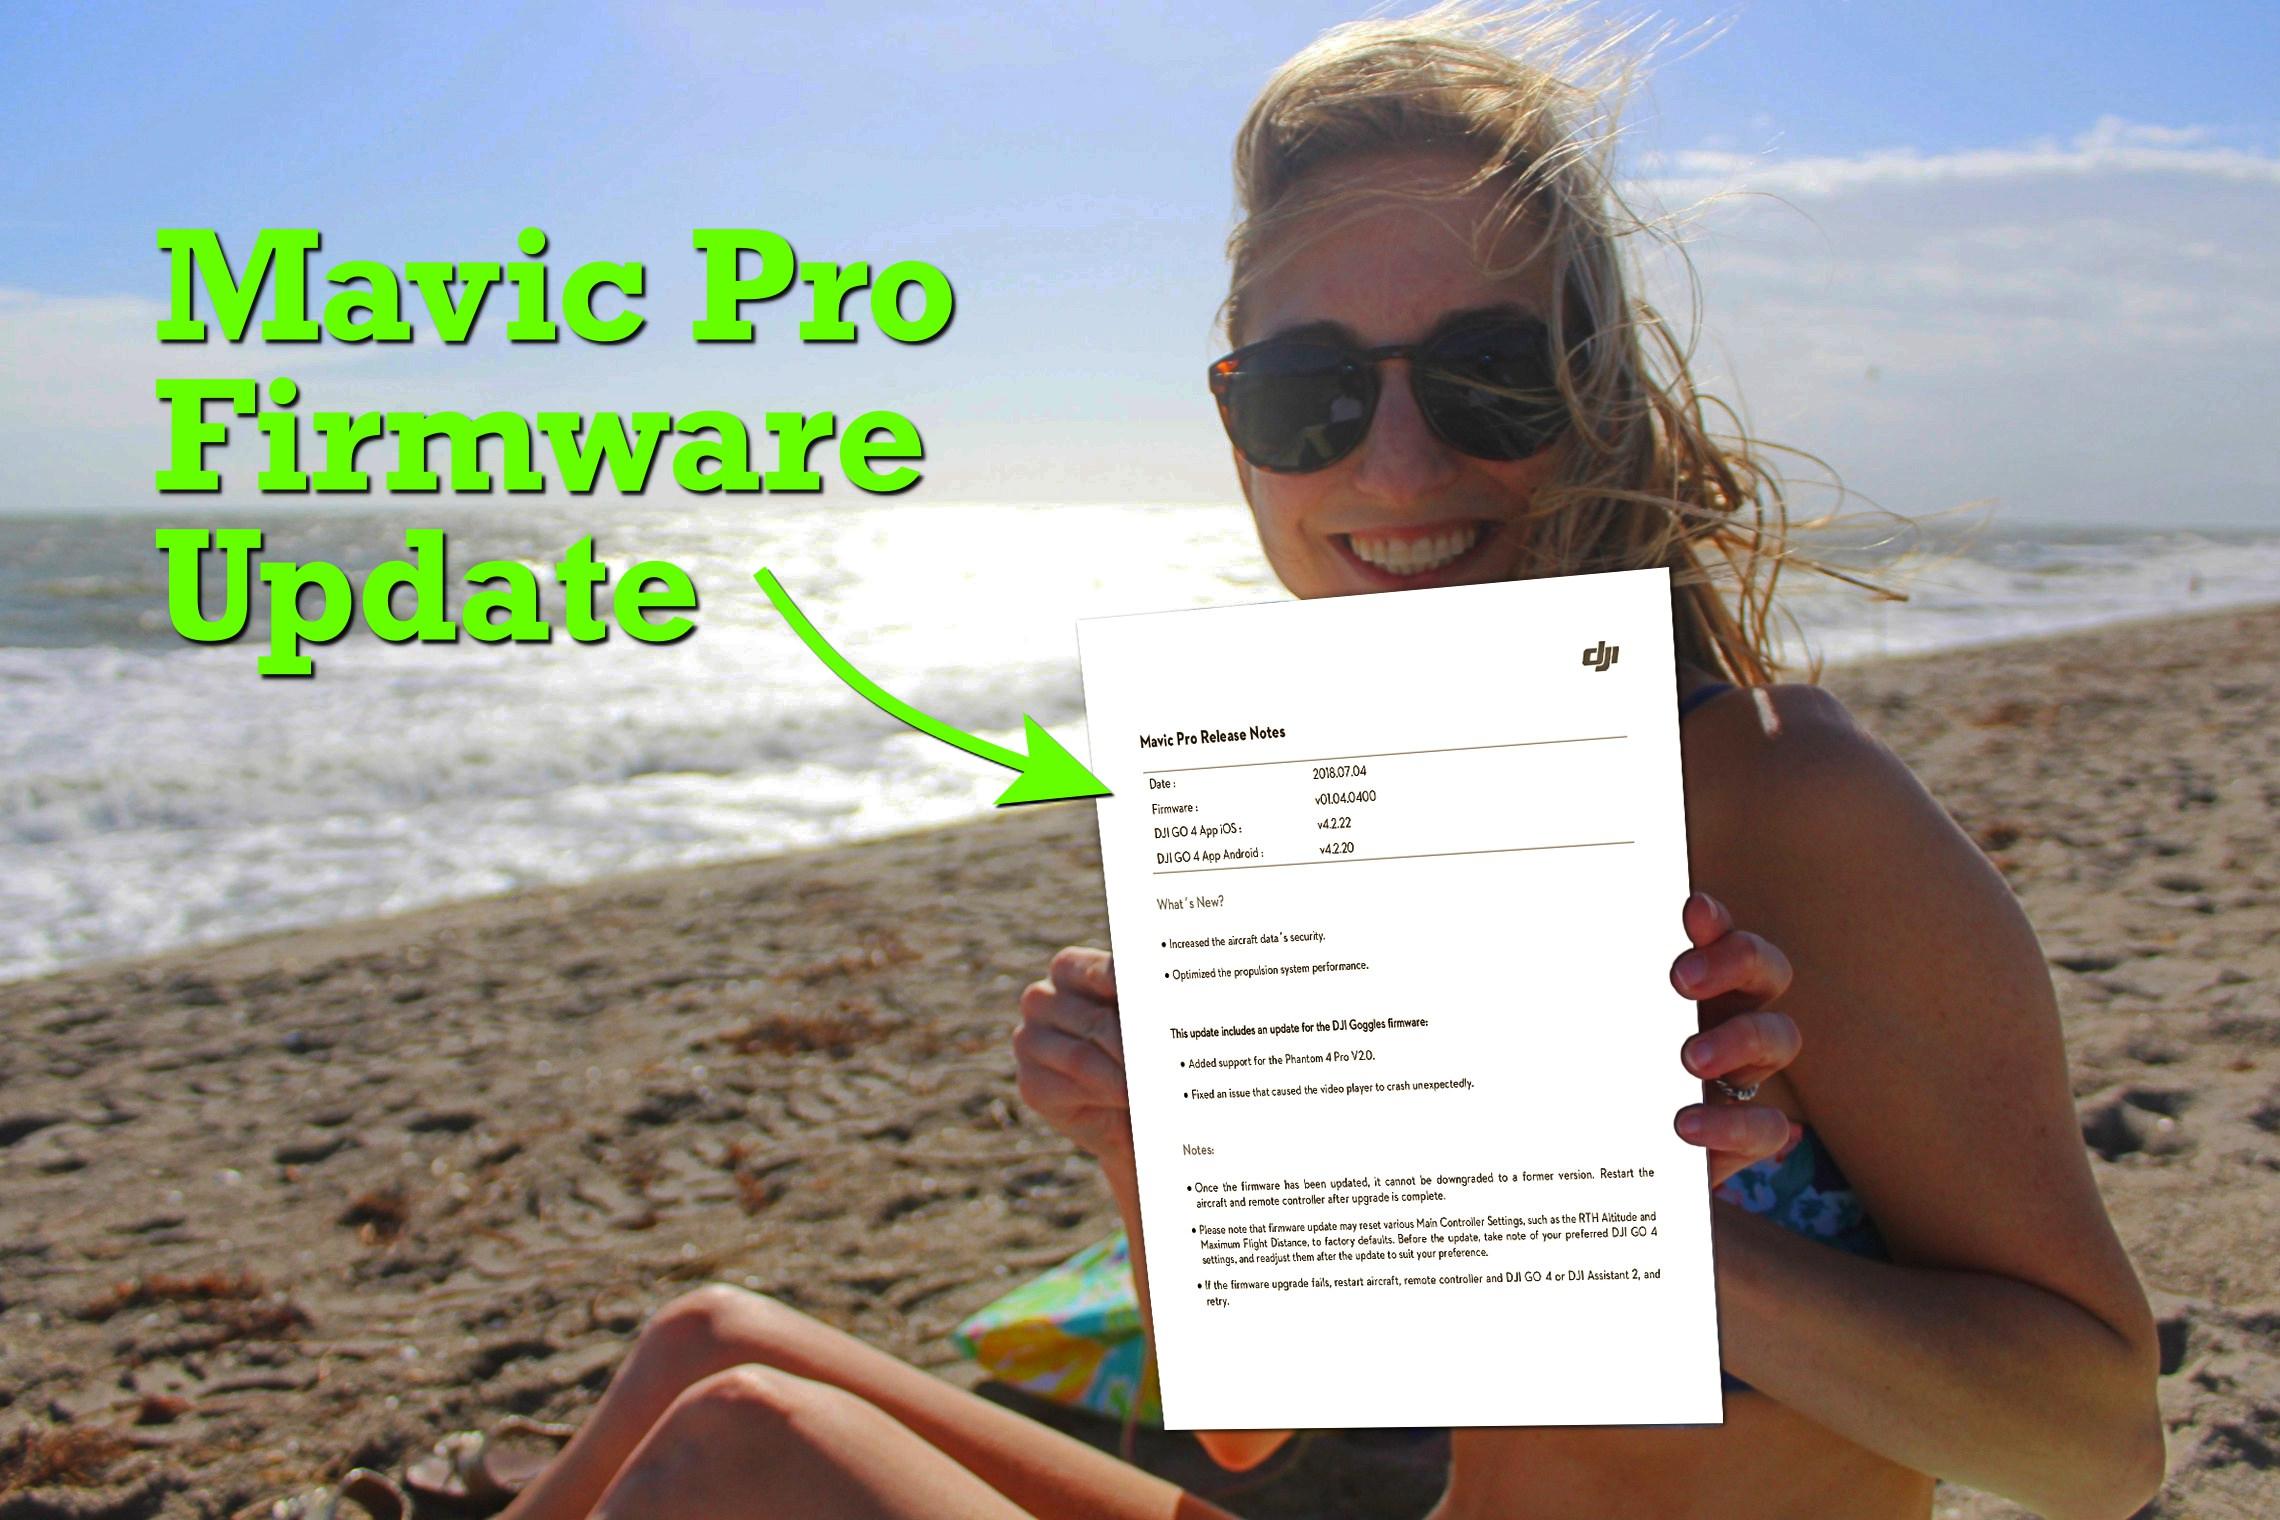 DJI Mavic Pro firmware update - v01 04 0400 - DroneDJ